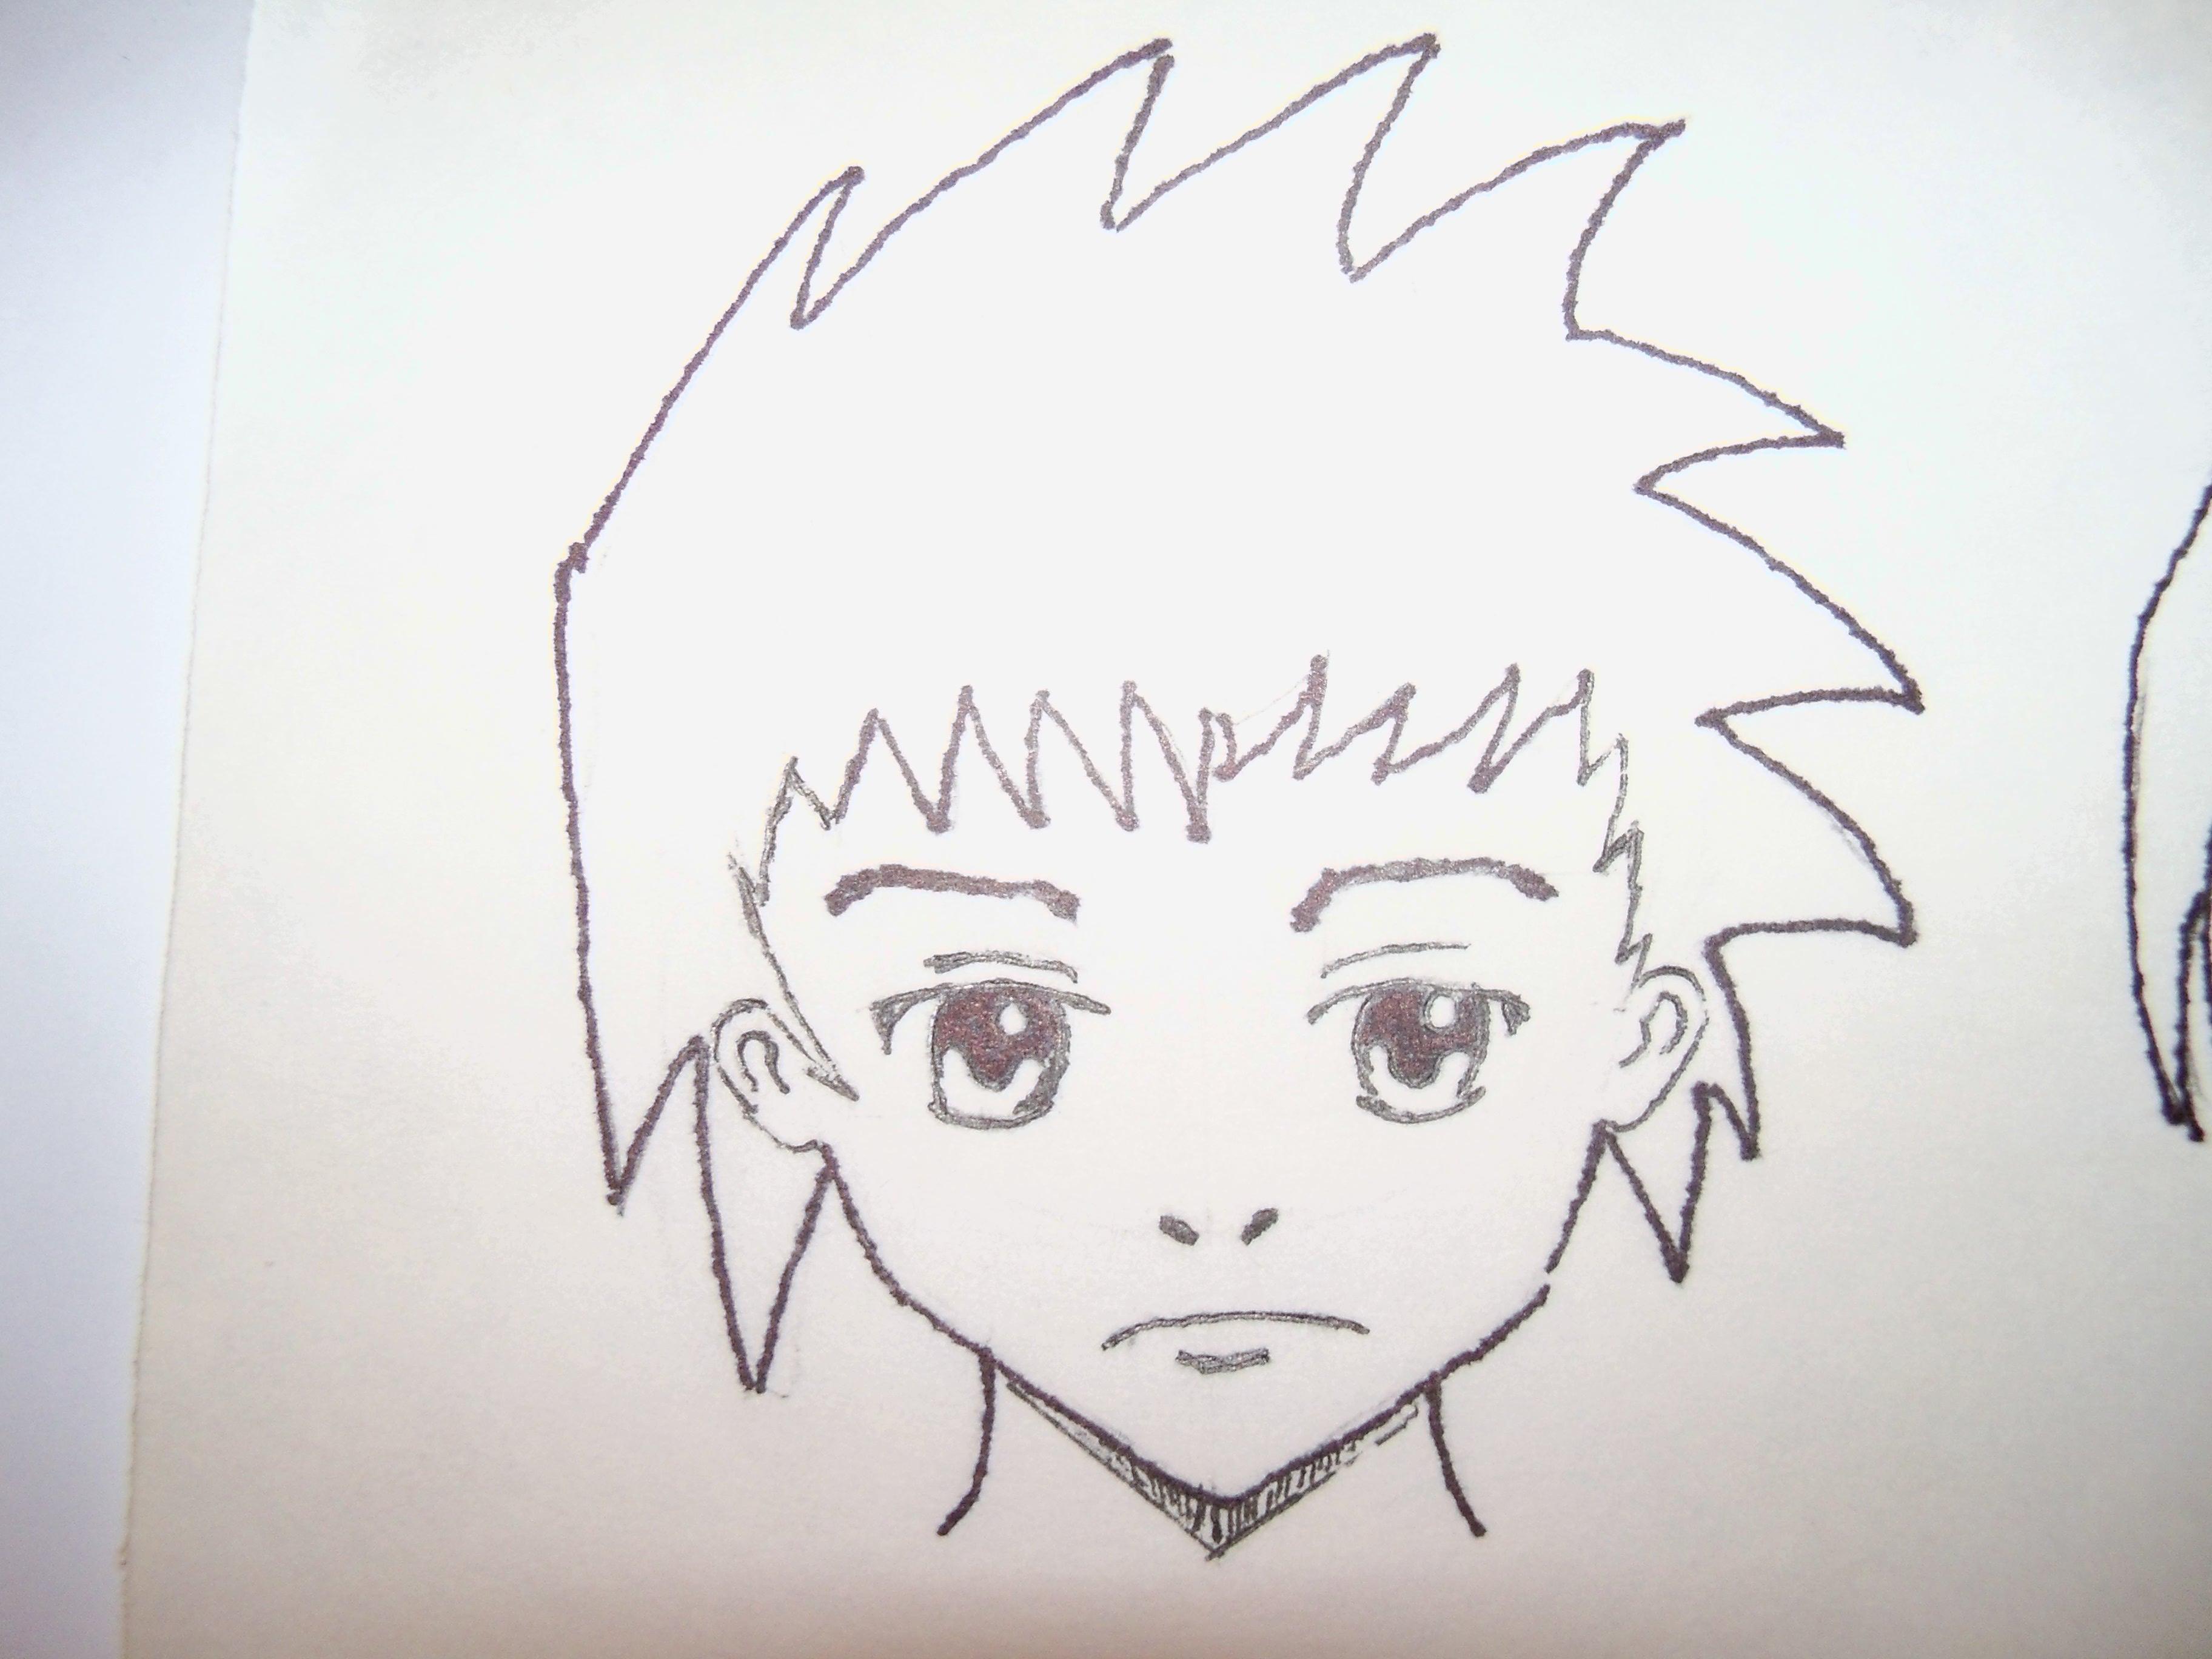 Drawn kopel boyfriend Moody Green : Haired Spiky